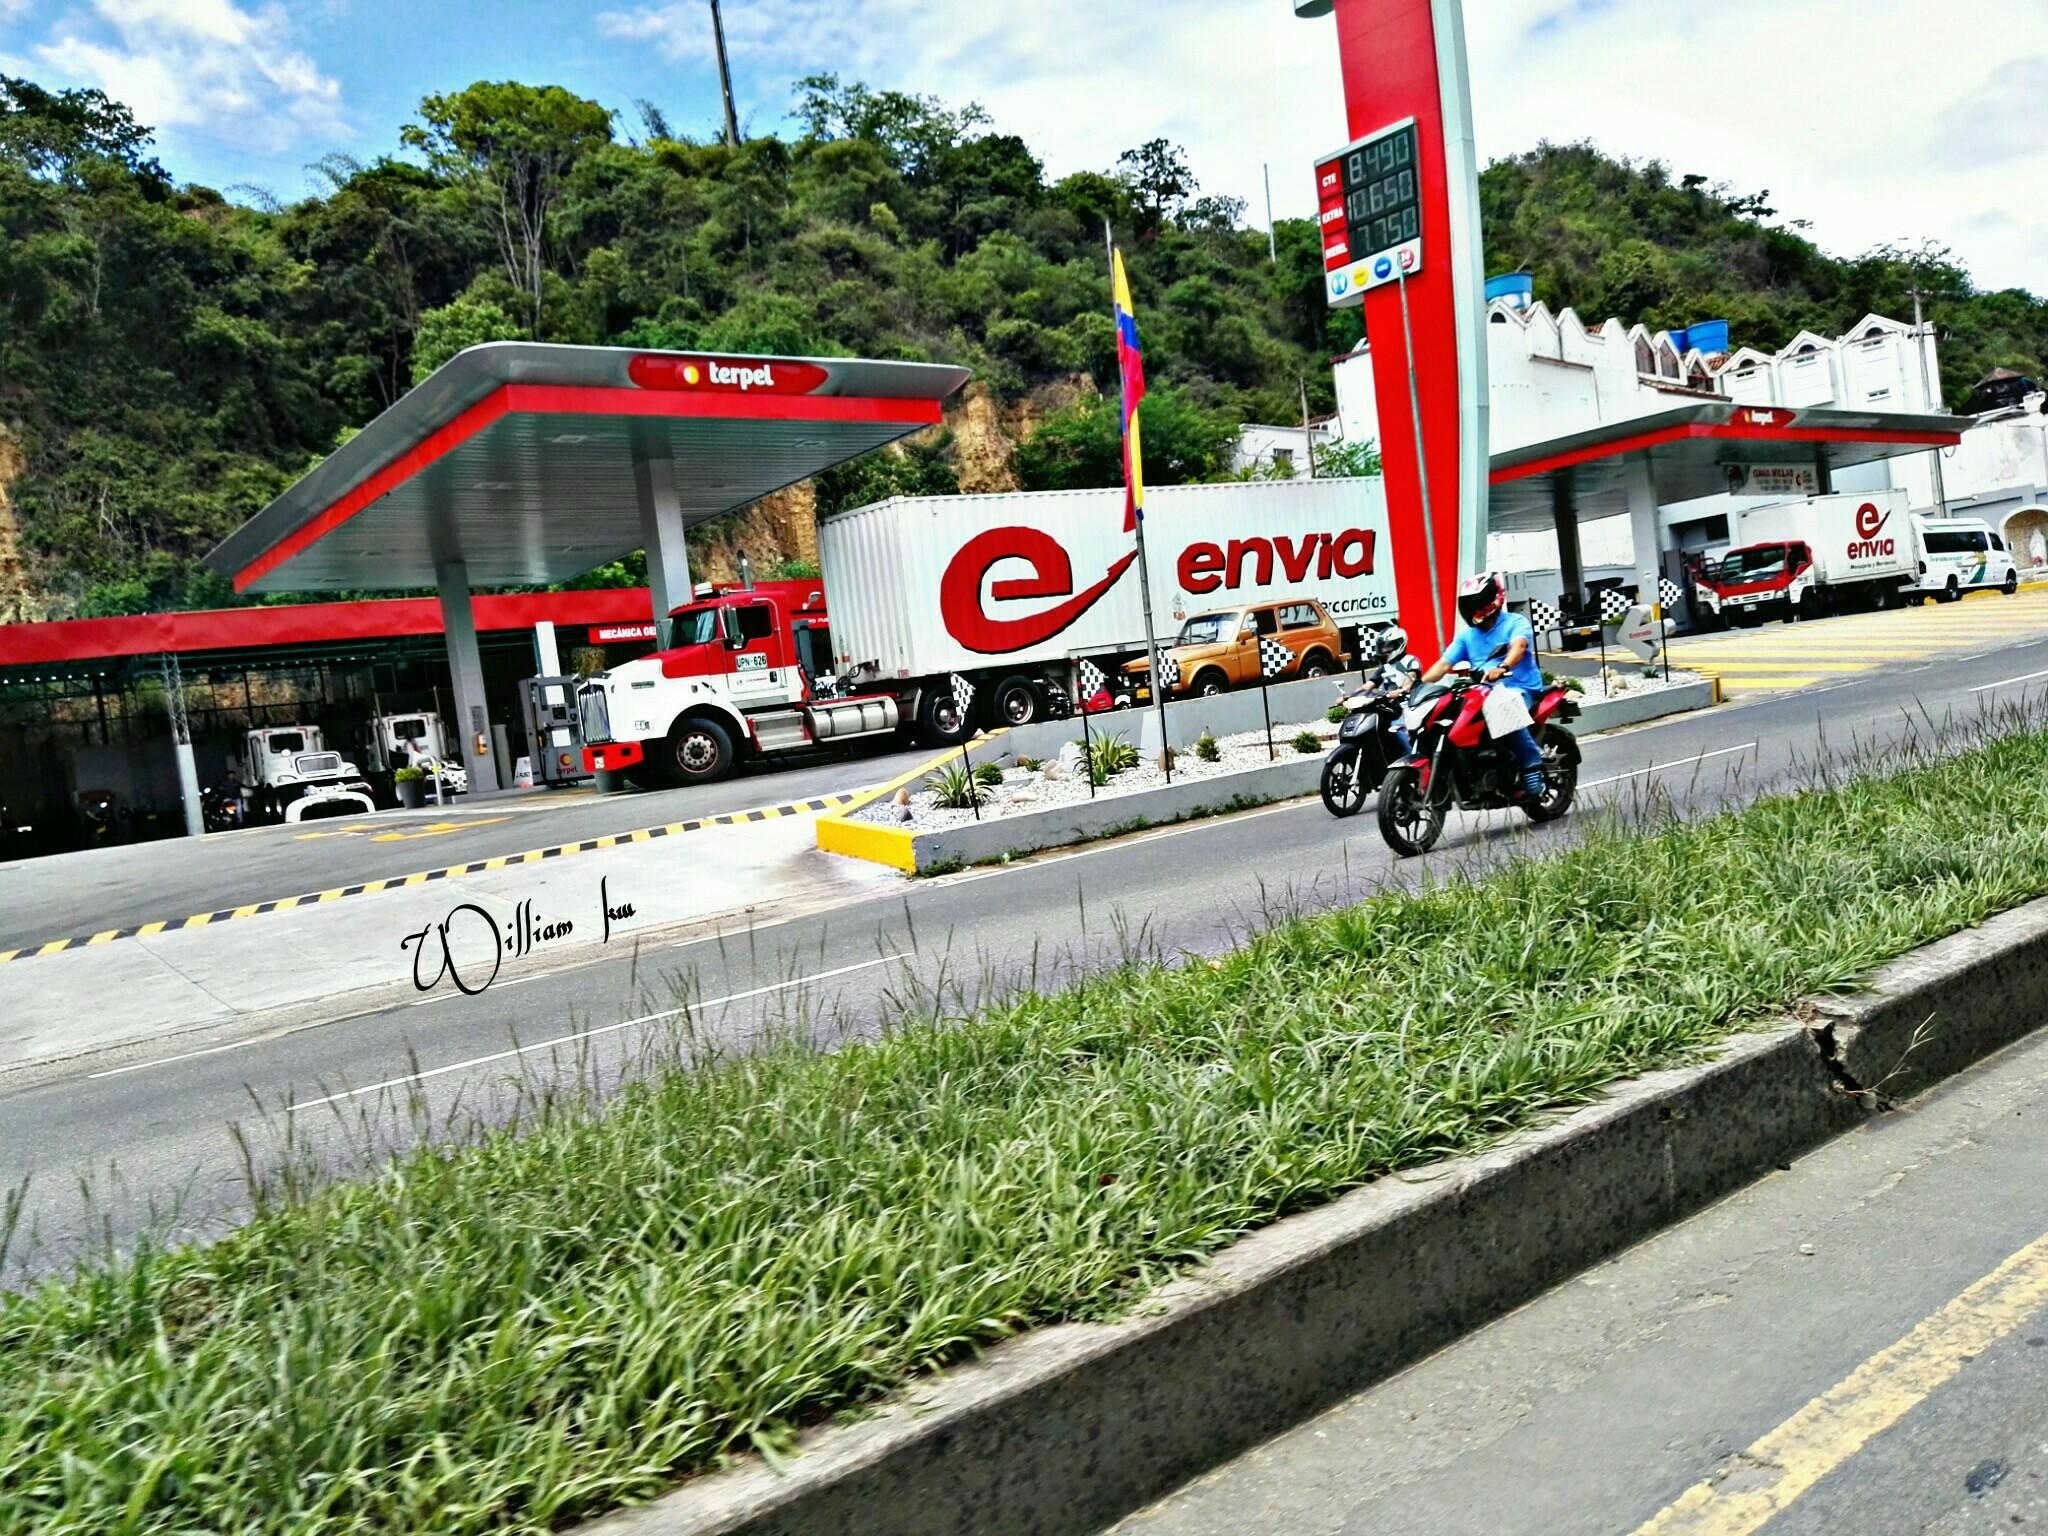 Camiones-Sencillo-Truck-Photo-31